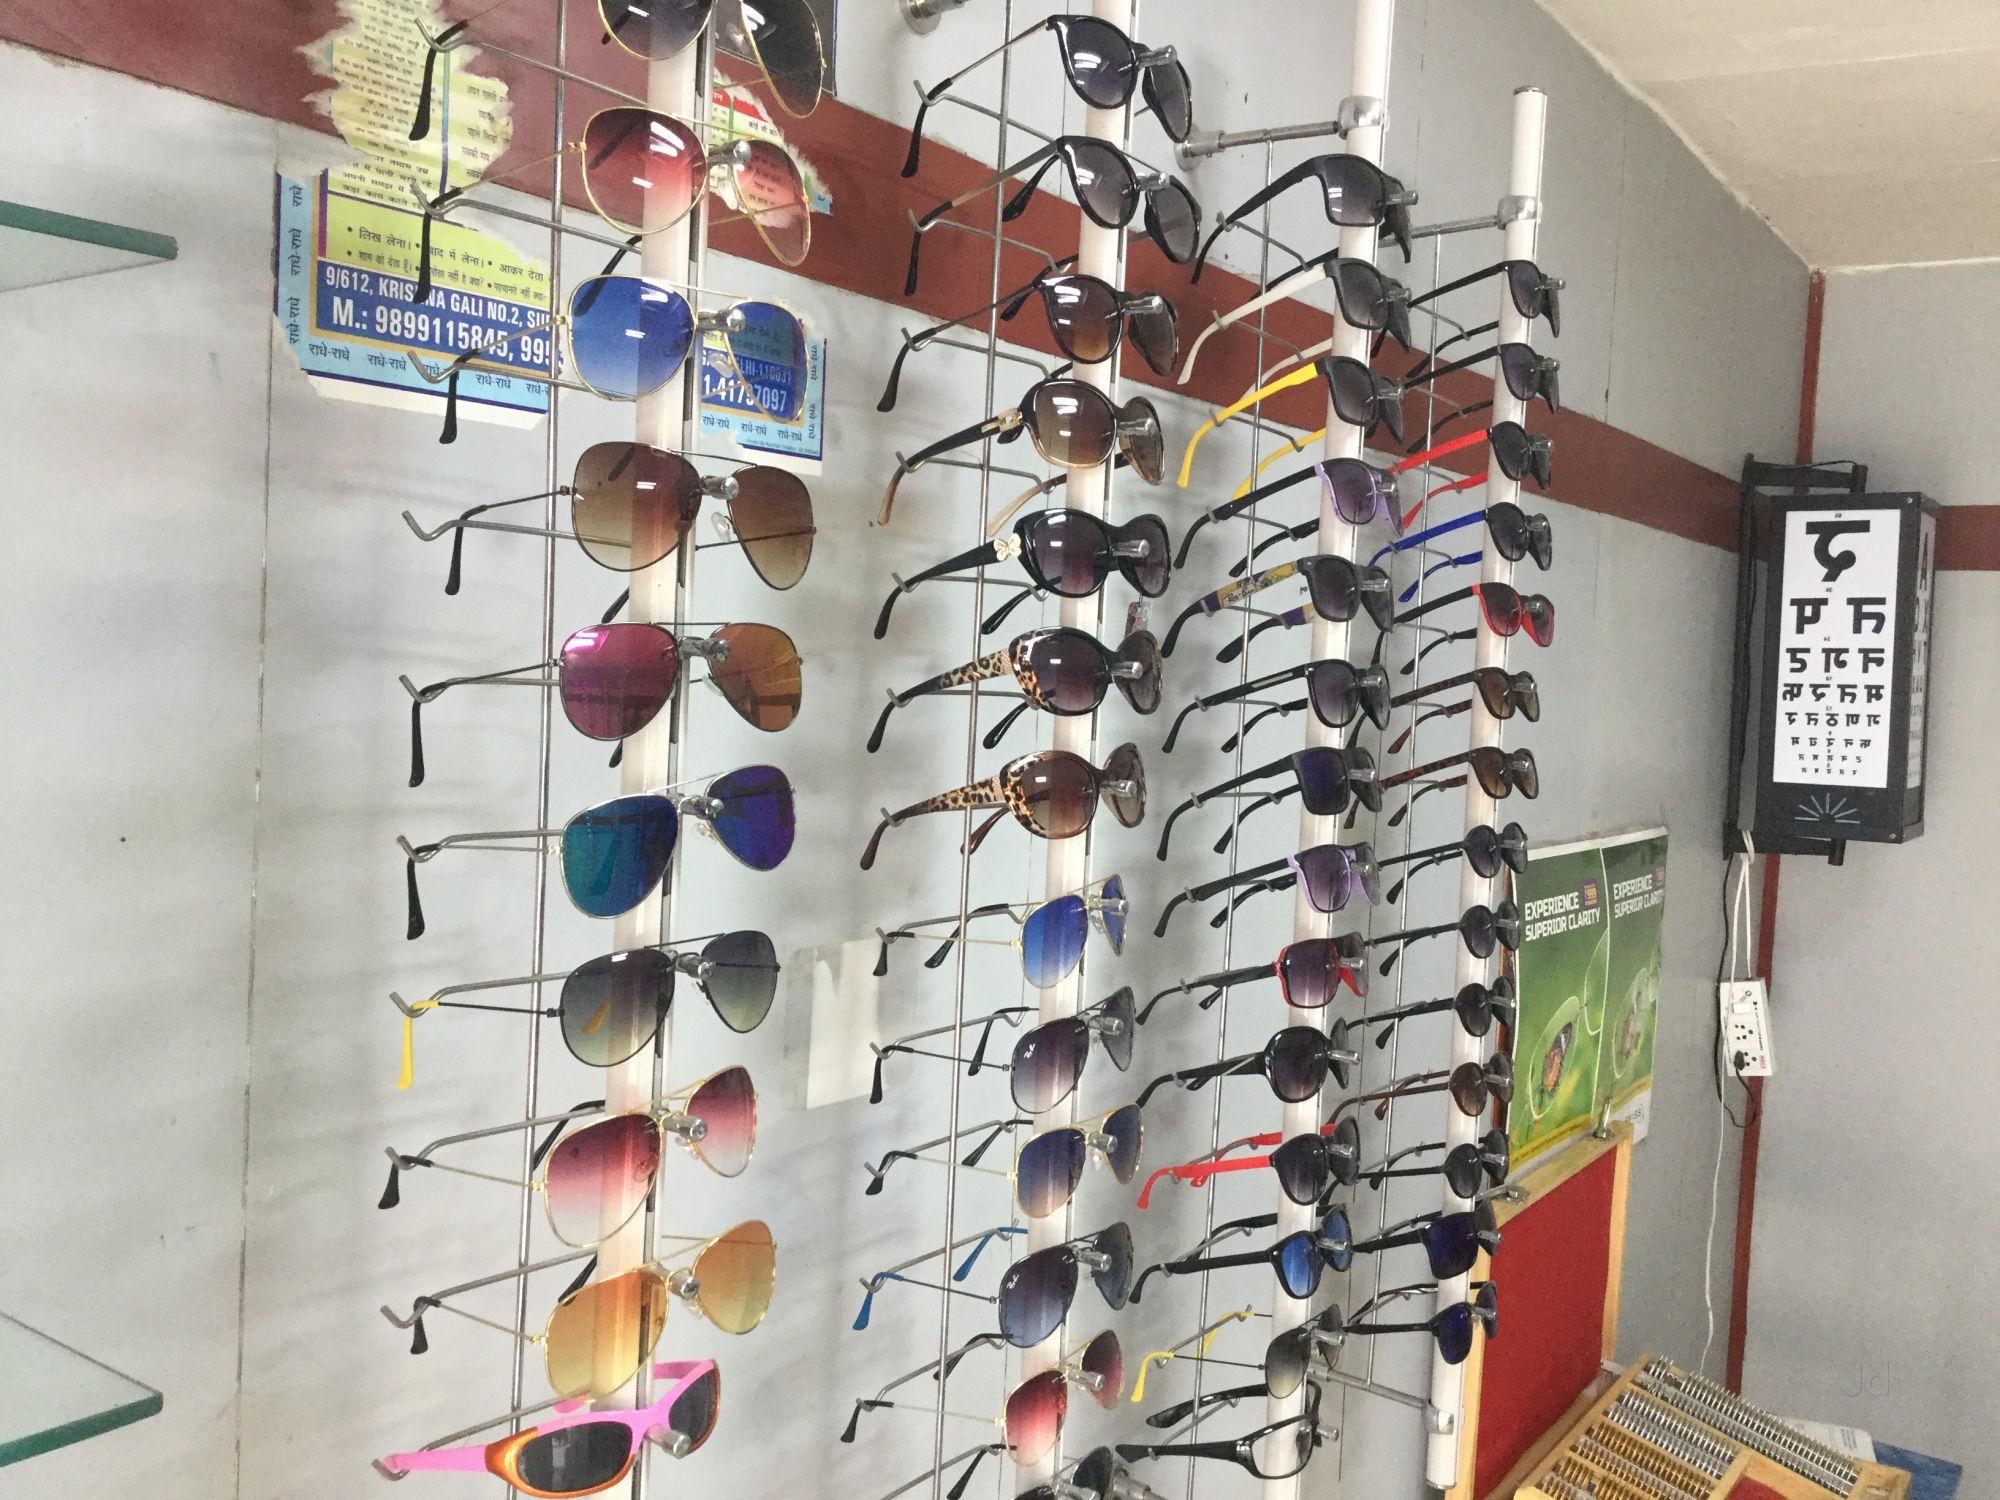 708b4608eda5 Top 100 Crizal Spectacle Lens Dealers in Noida Sector 50 - Best ...